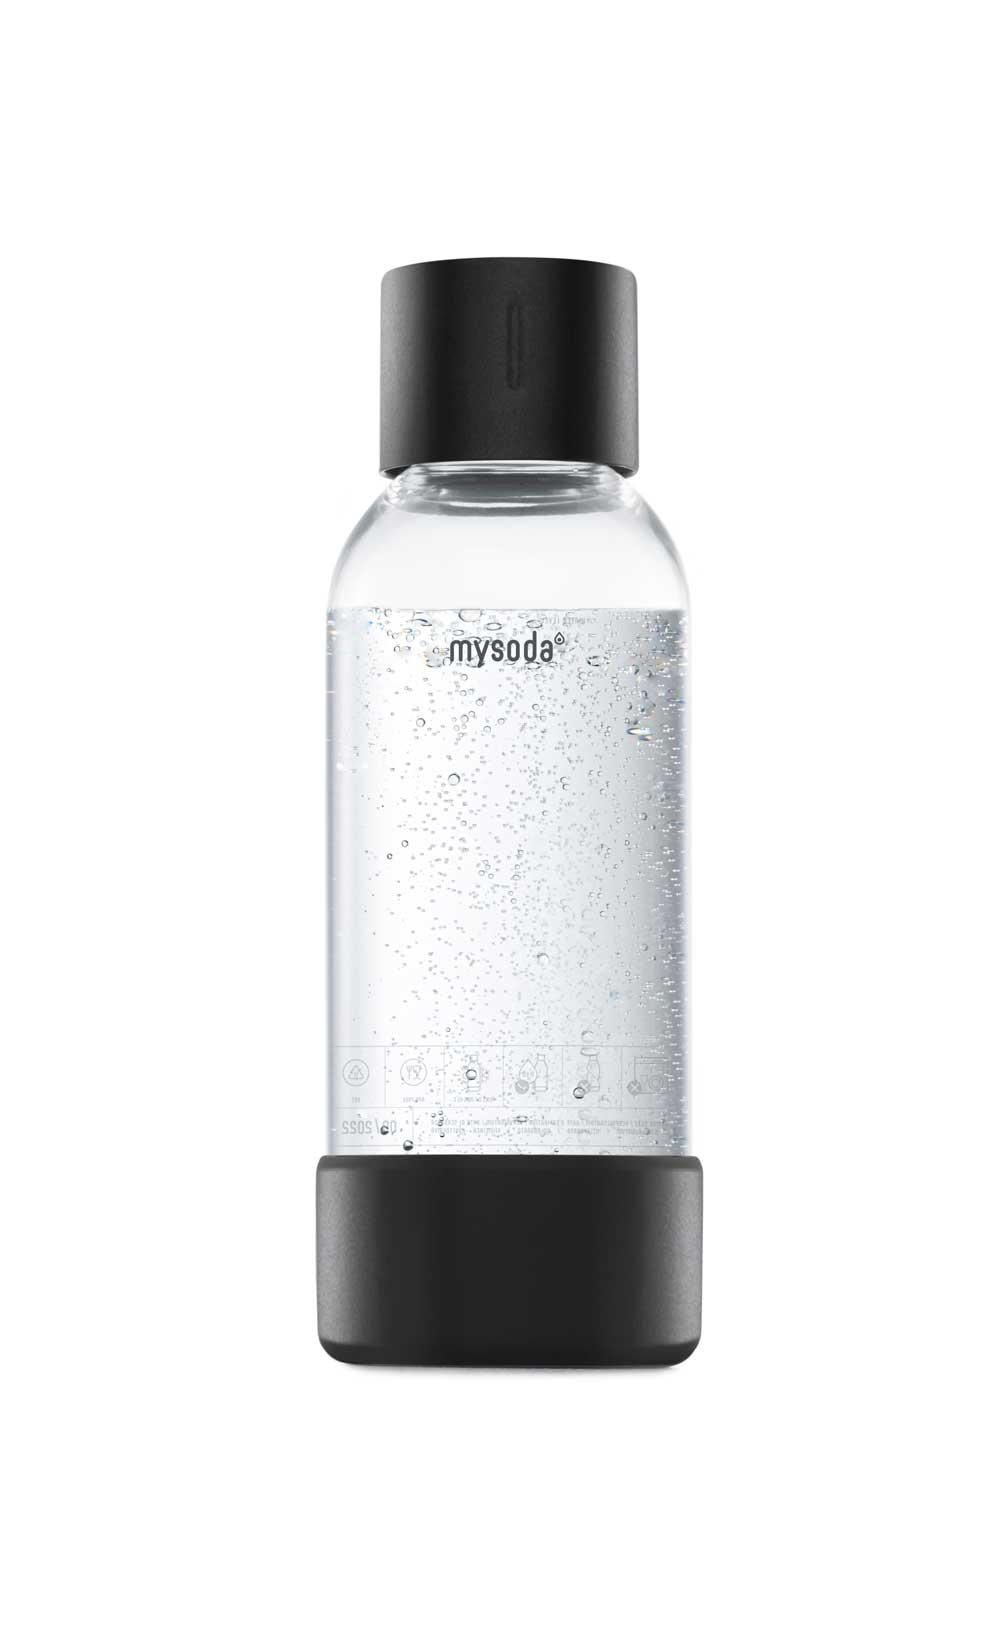 Mysoda Bottle 0.5L Black Metal